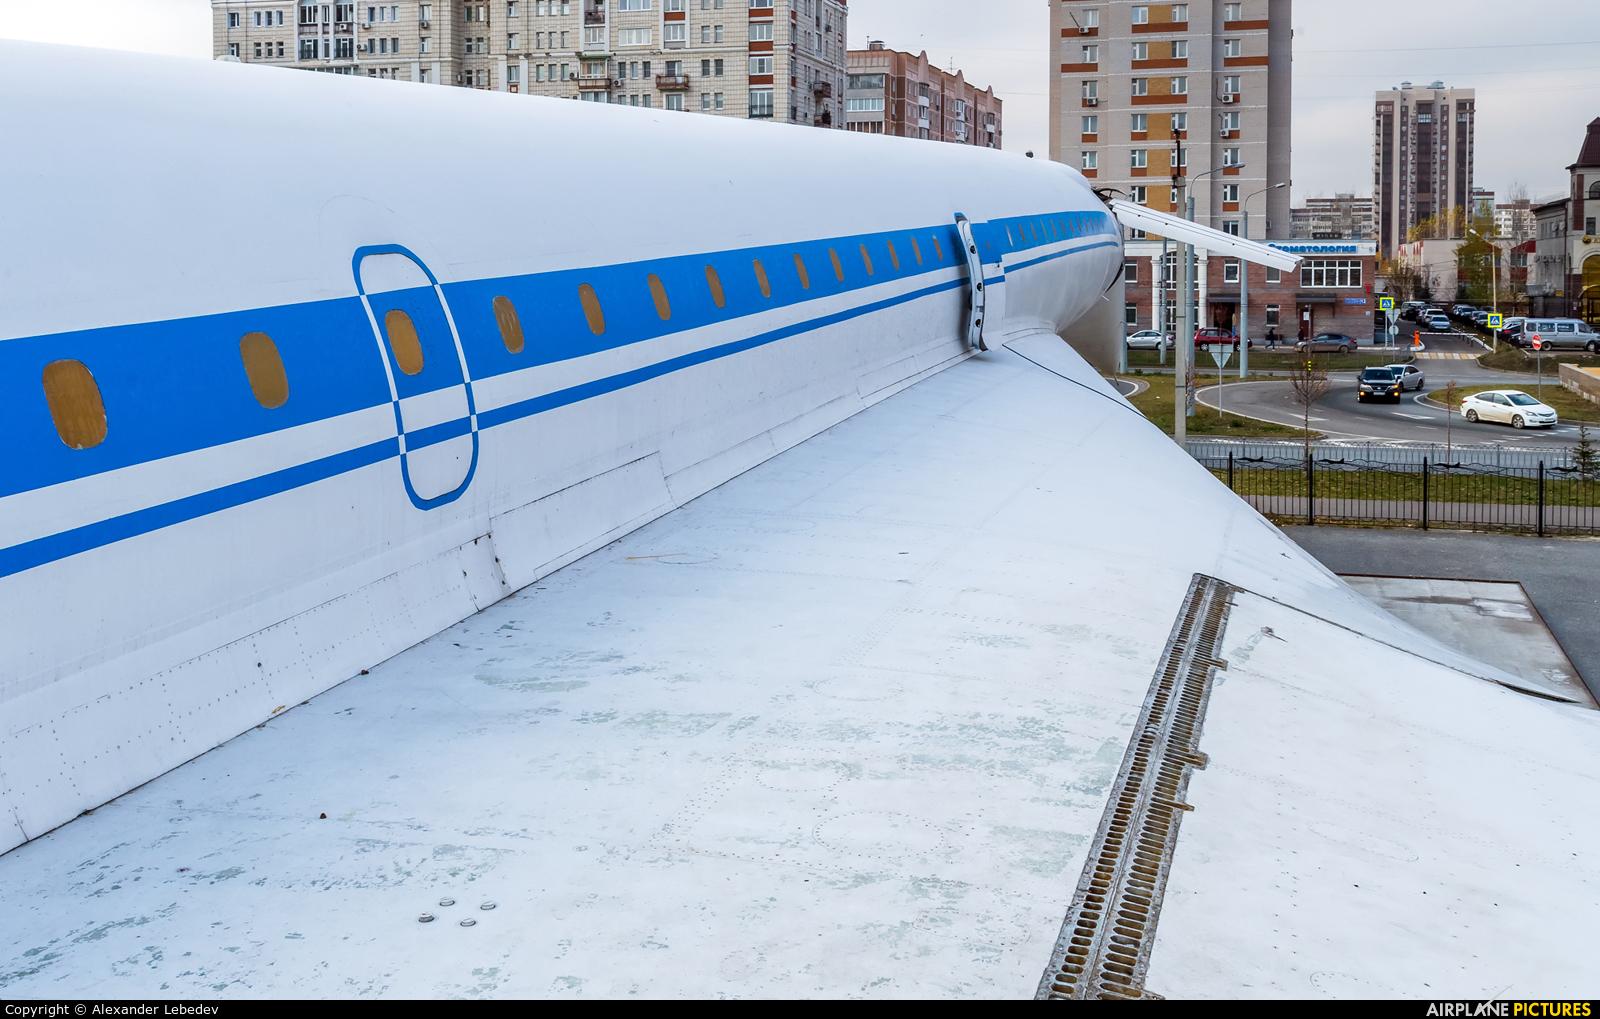 Aeroflot CCCР-77107 aircraft at Off Airport - Russia